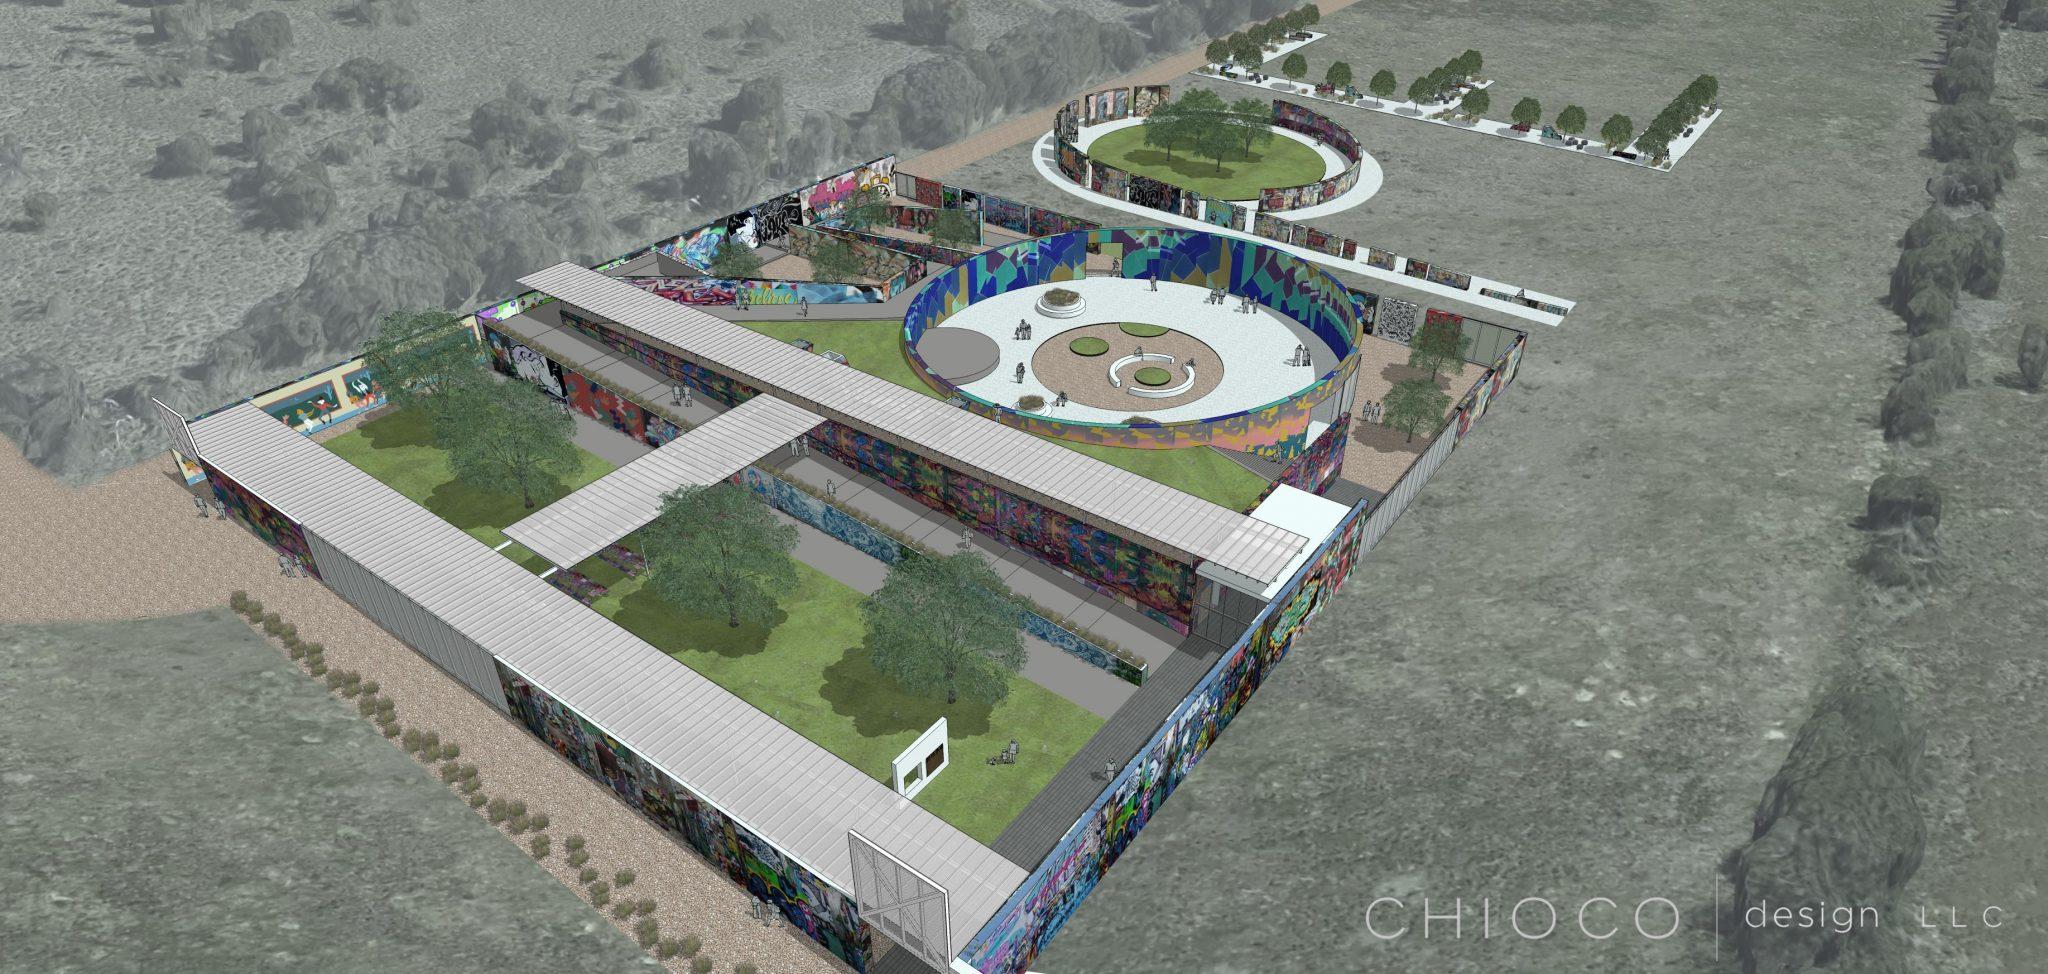 Rendering of Hope Outdoor Gallery. Chioco Design